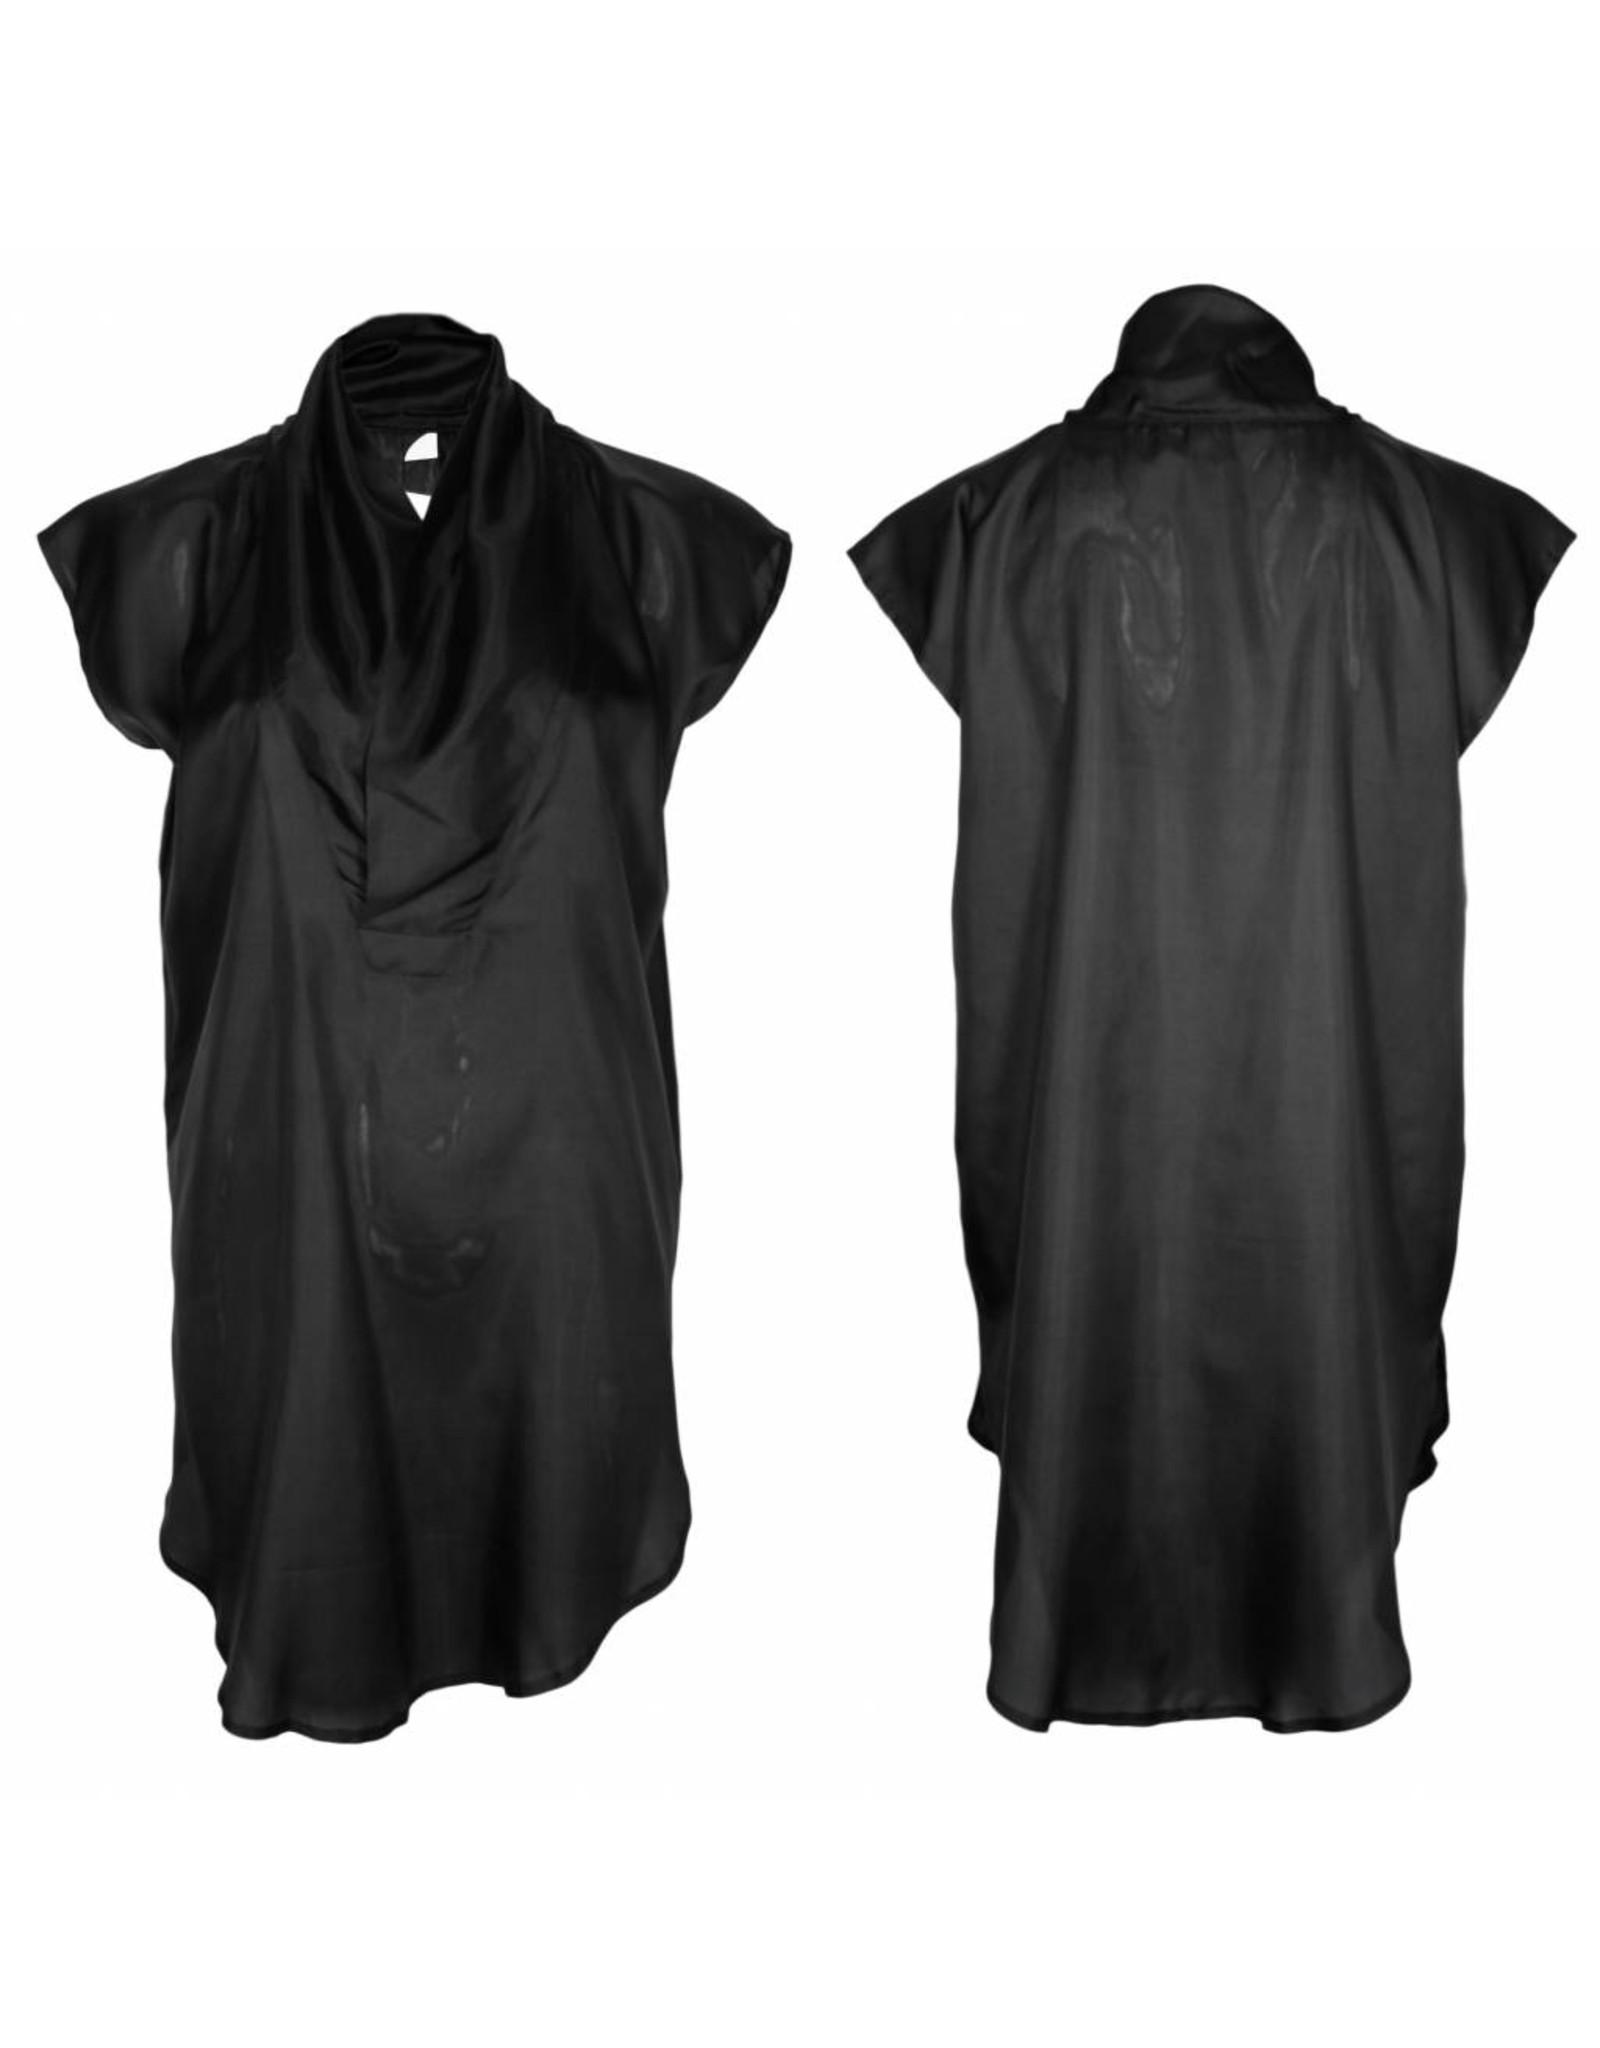 format TOAT dressblouse, silk